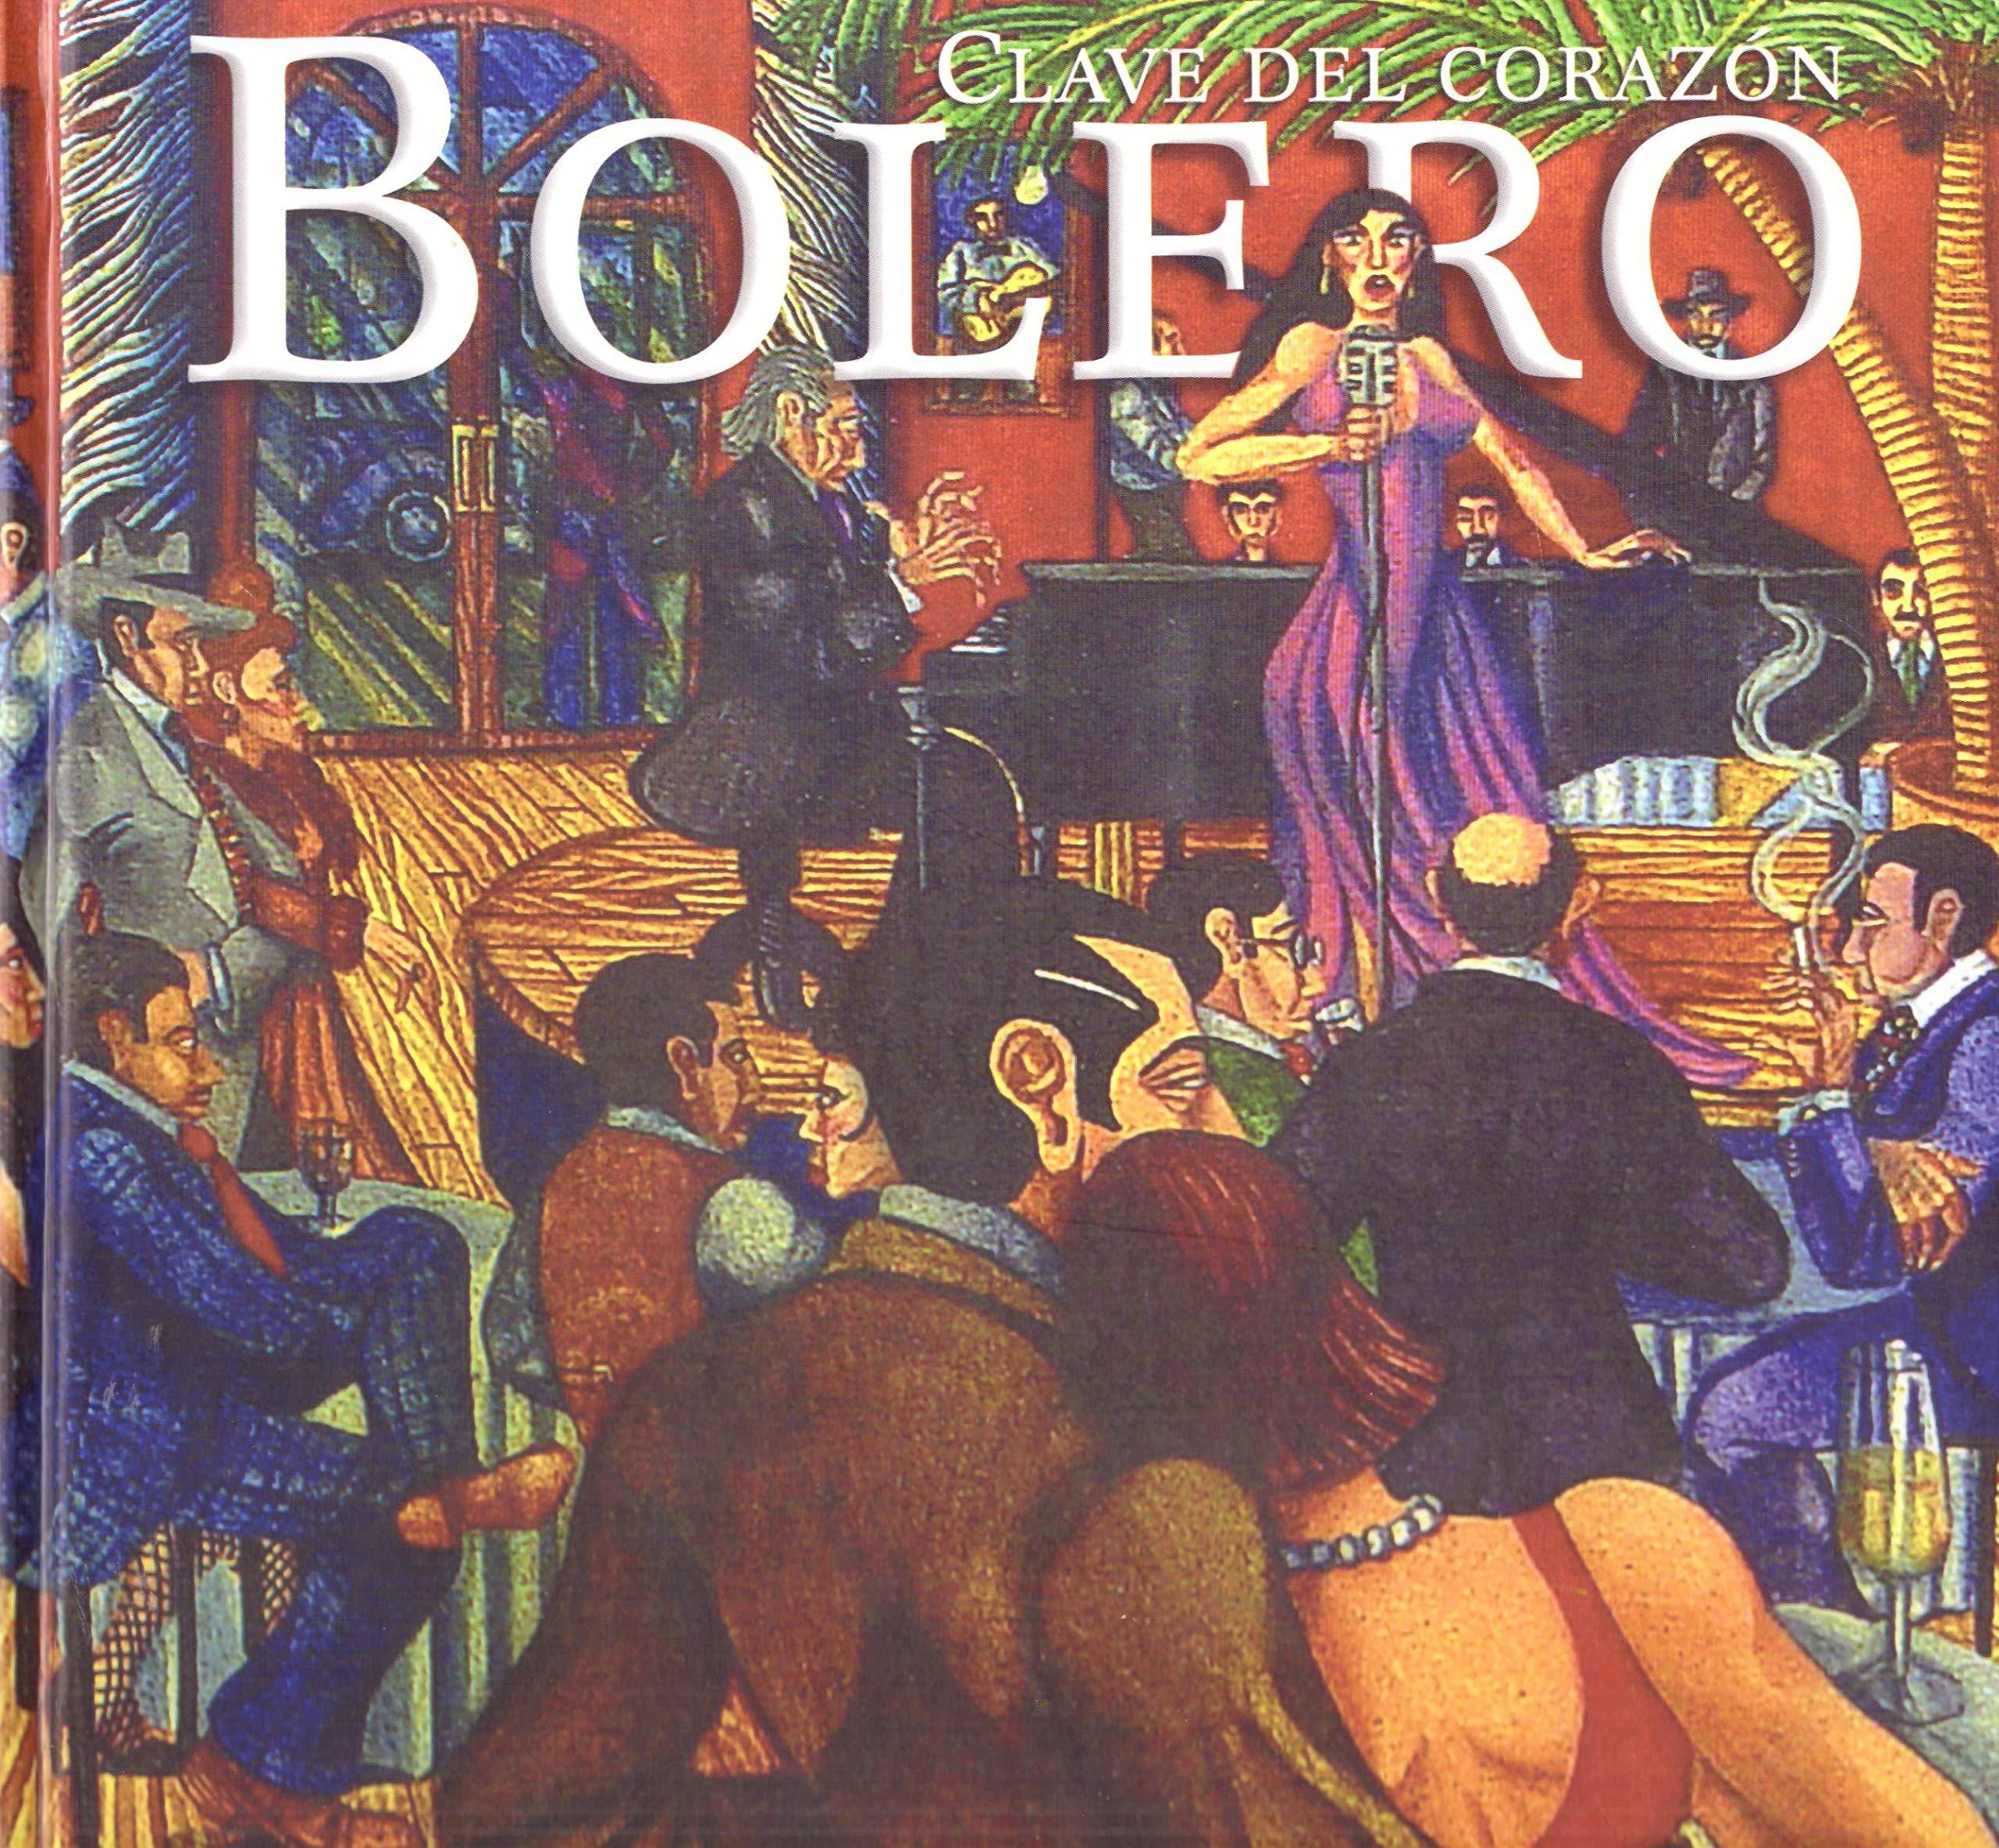 Bolero/ Bolero Code Of Heart: Clave del corazon (Ediciones Varias) (Spanish Edition) (Spanish) Hardcover – February 2, 2005